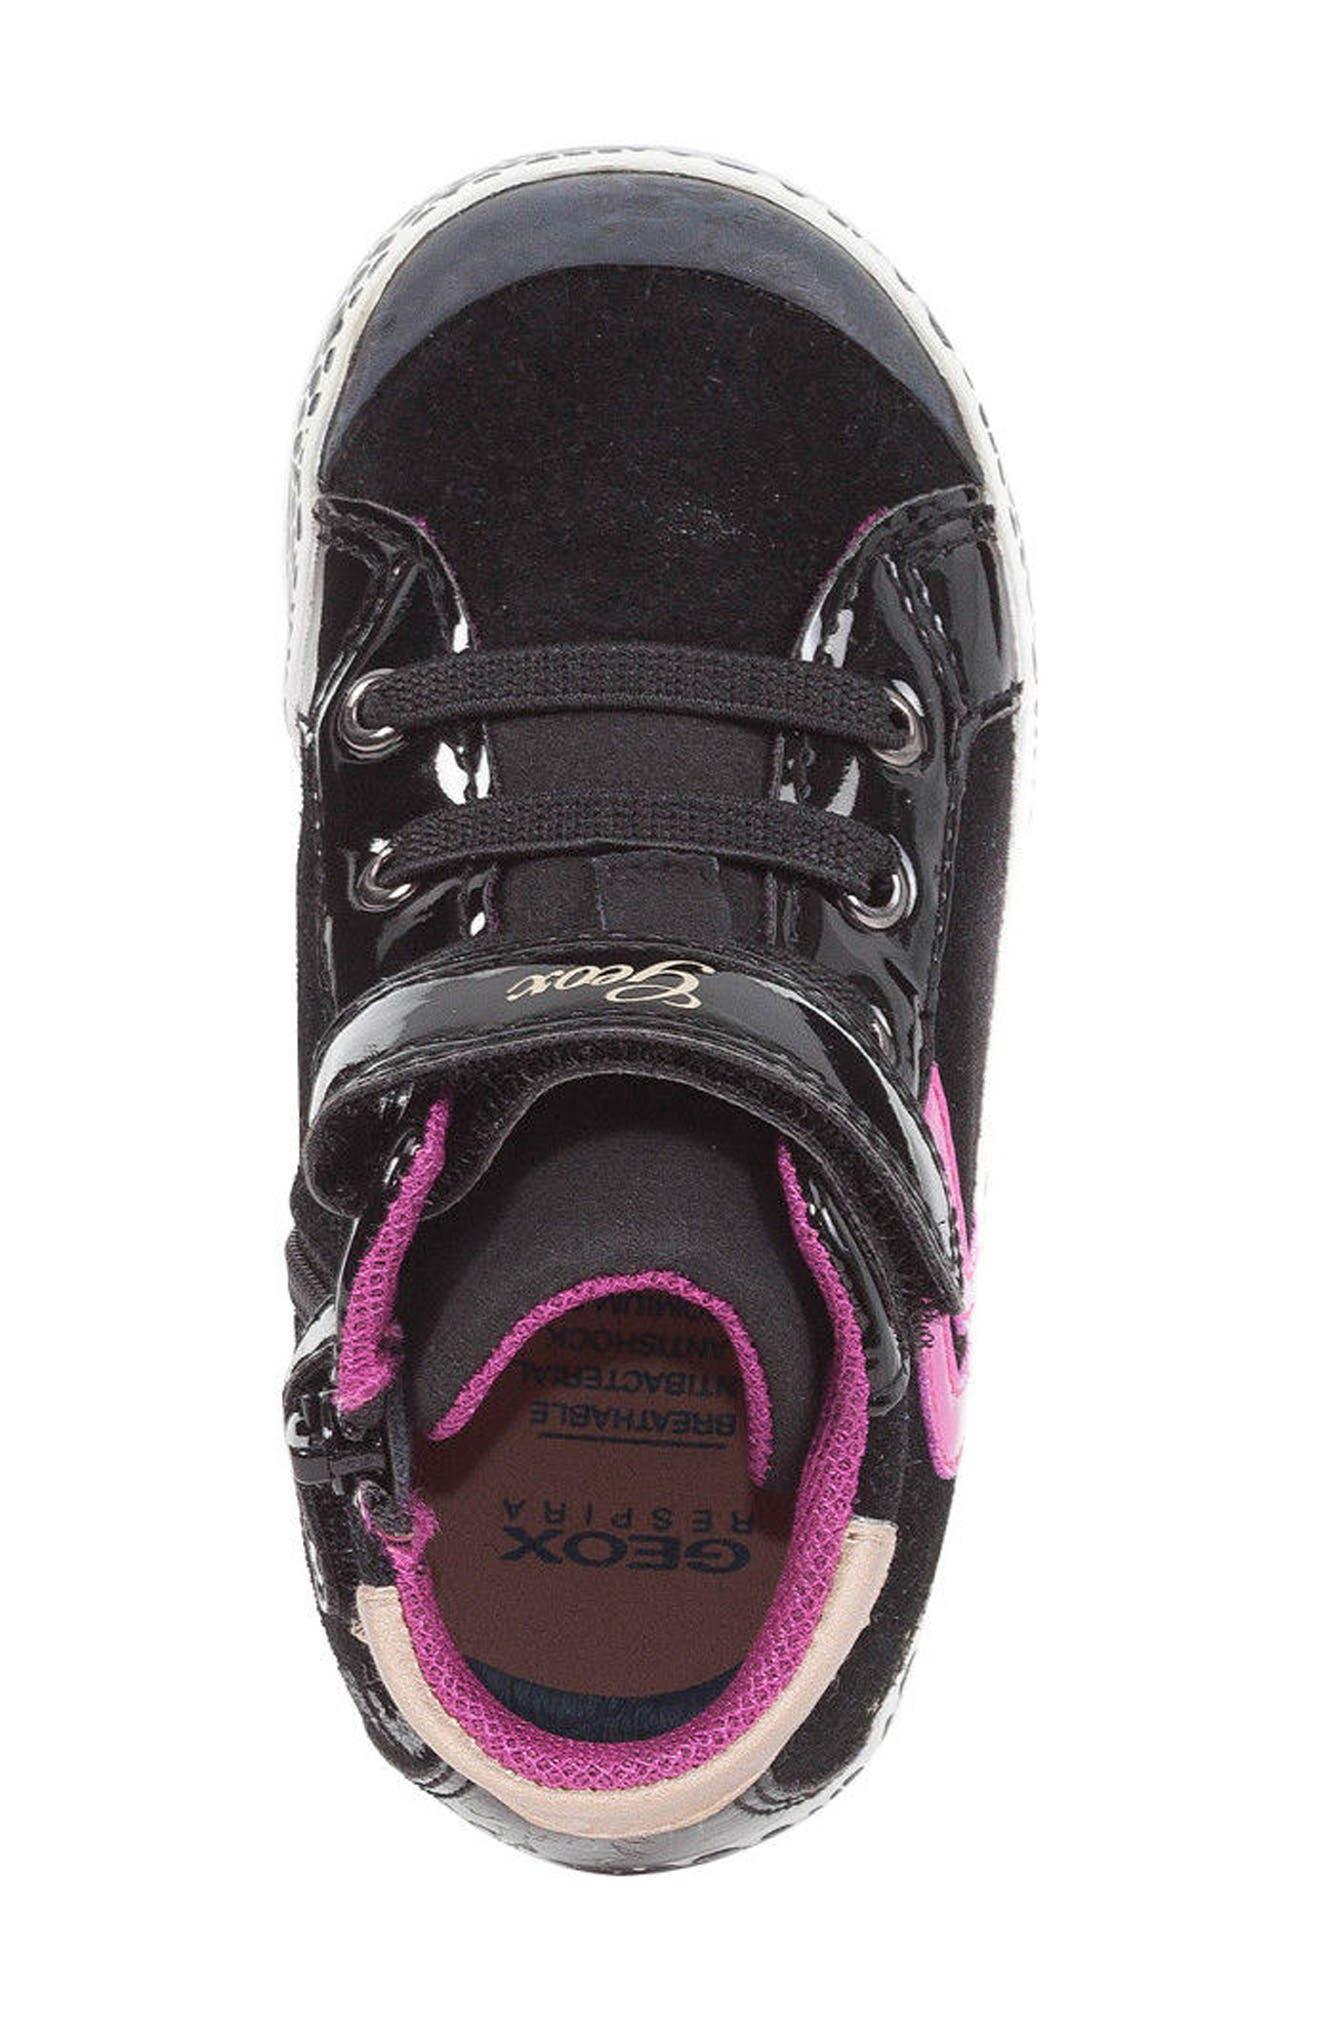 Kiwi Girl High Top Sneaker,                             Alternate thumbnail 5, color,                             Black/ Cyclamen